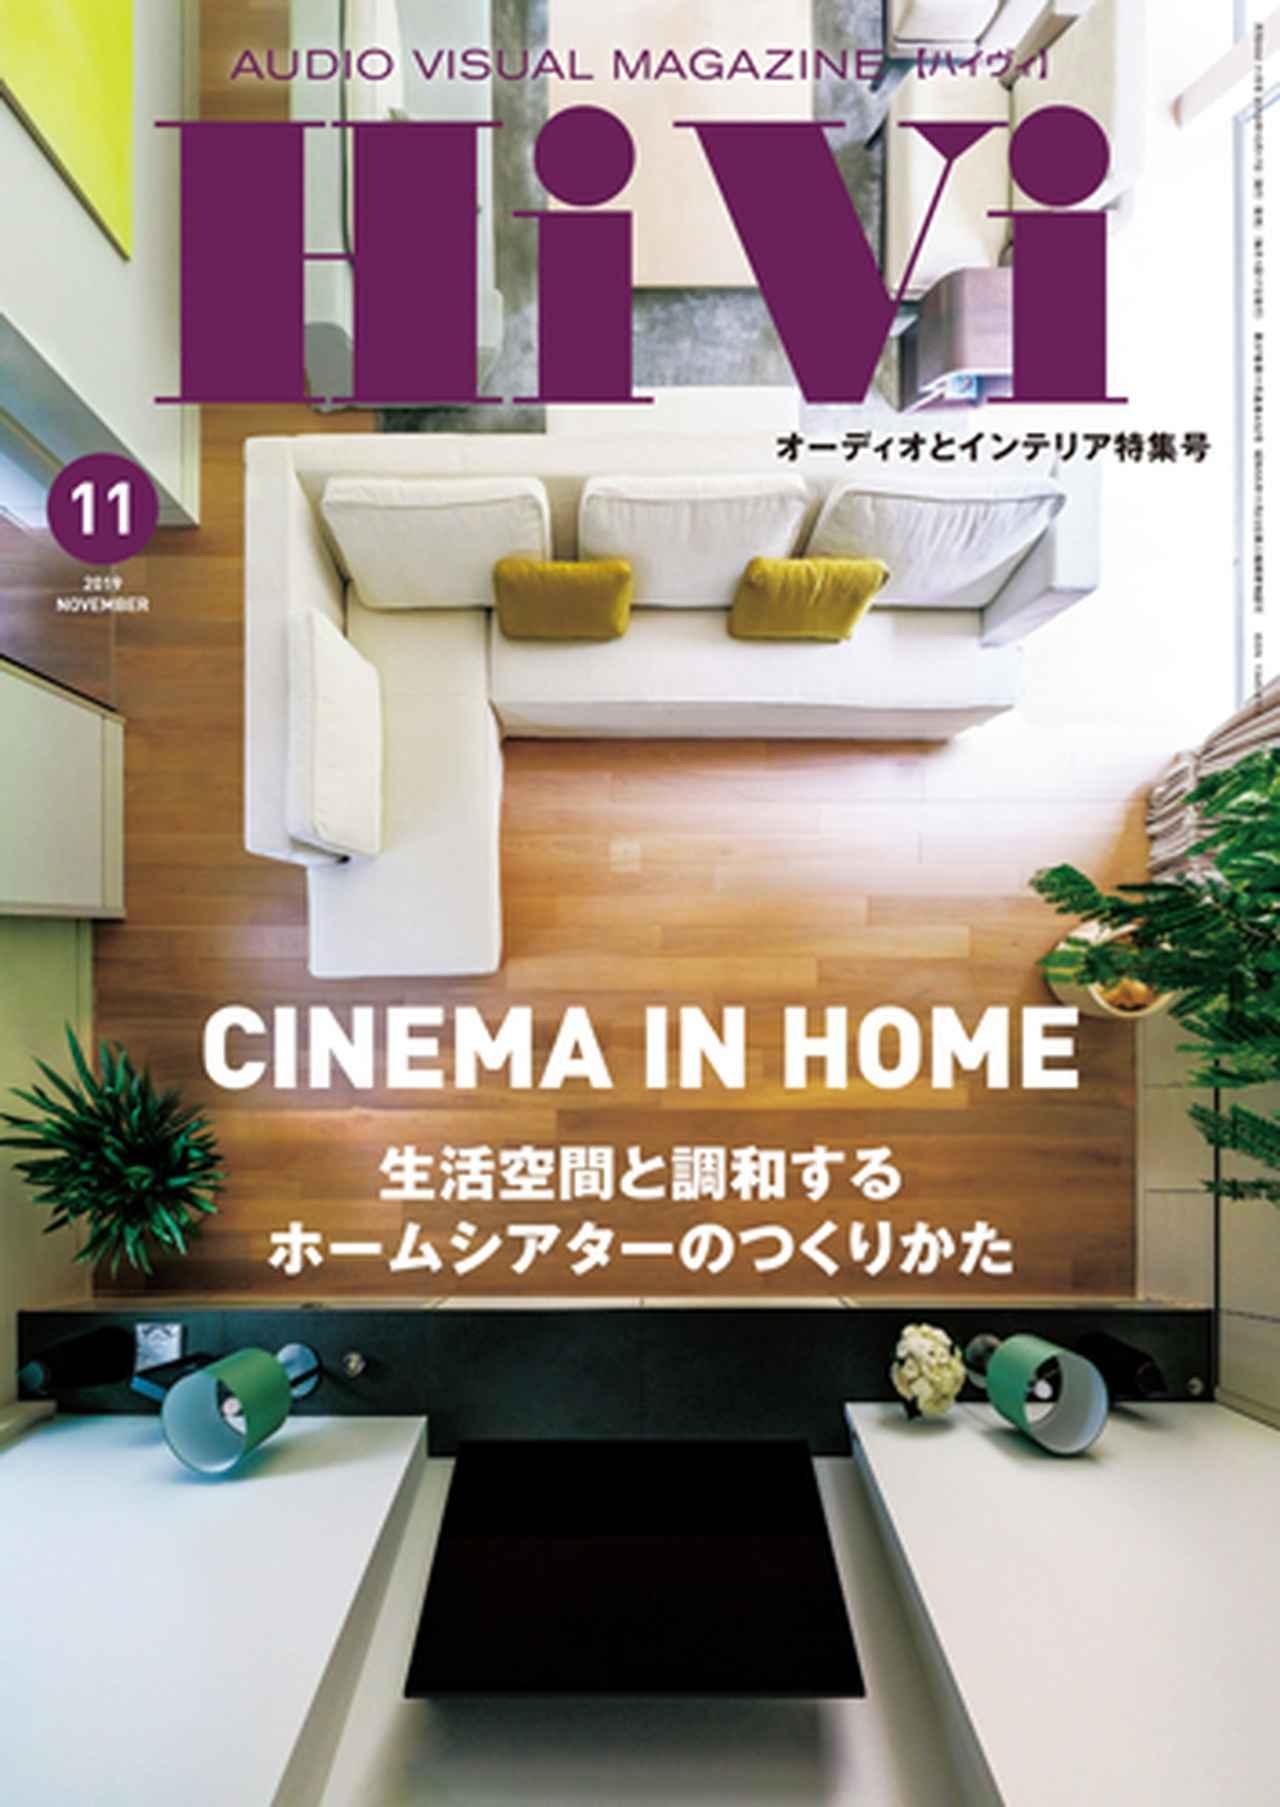 画像: HiVi 2019年11月号